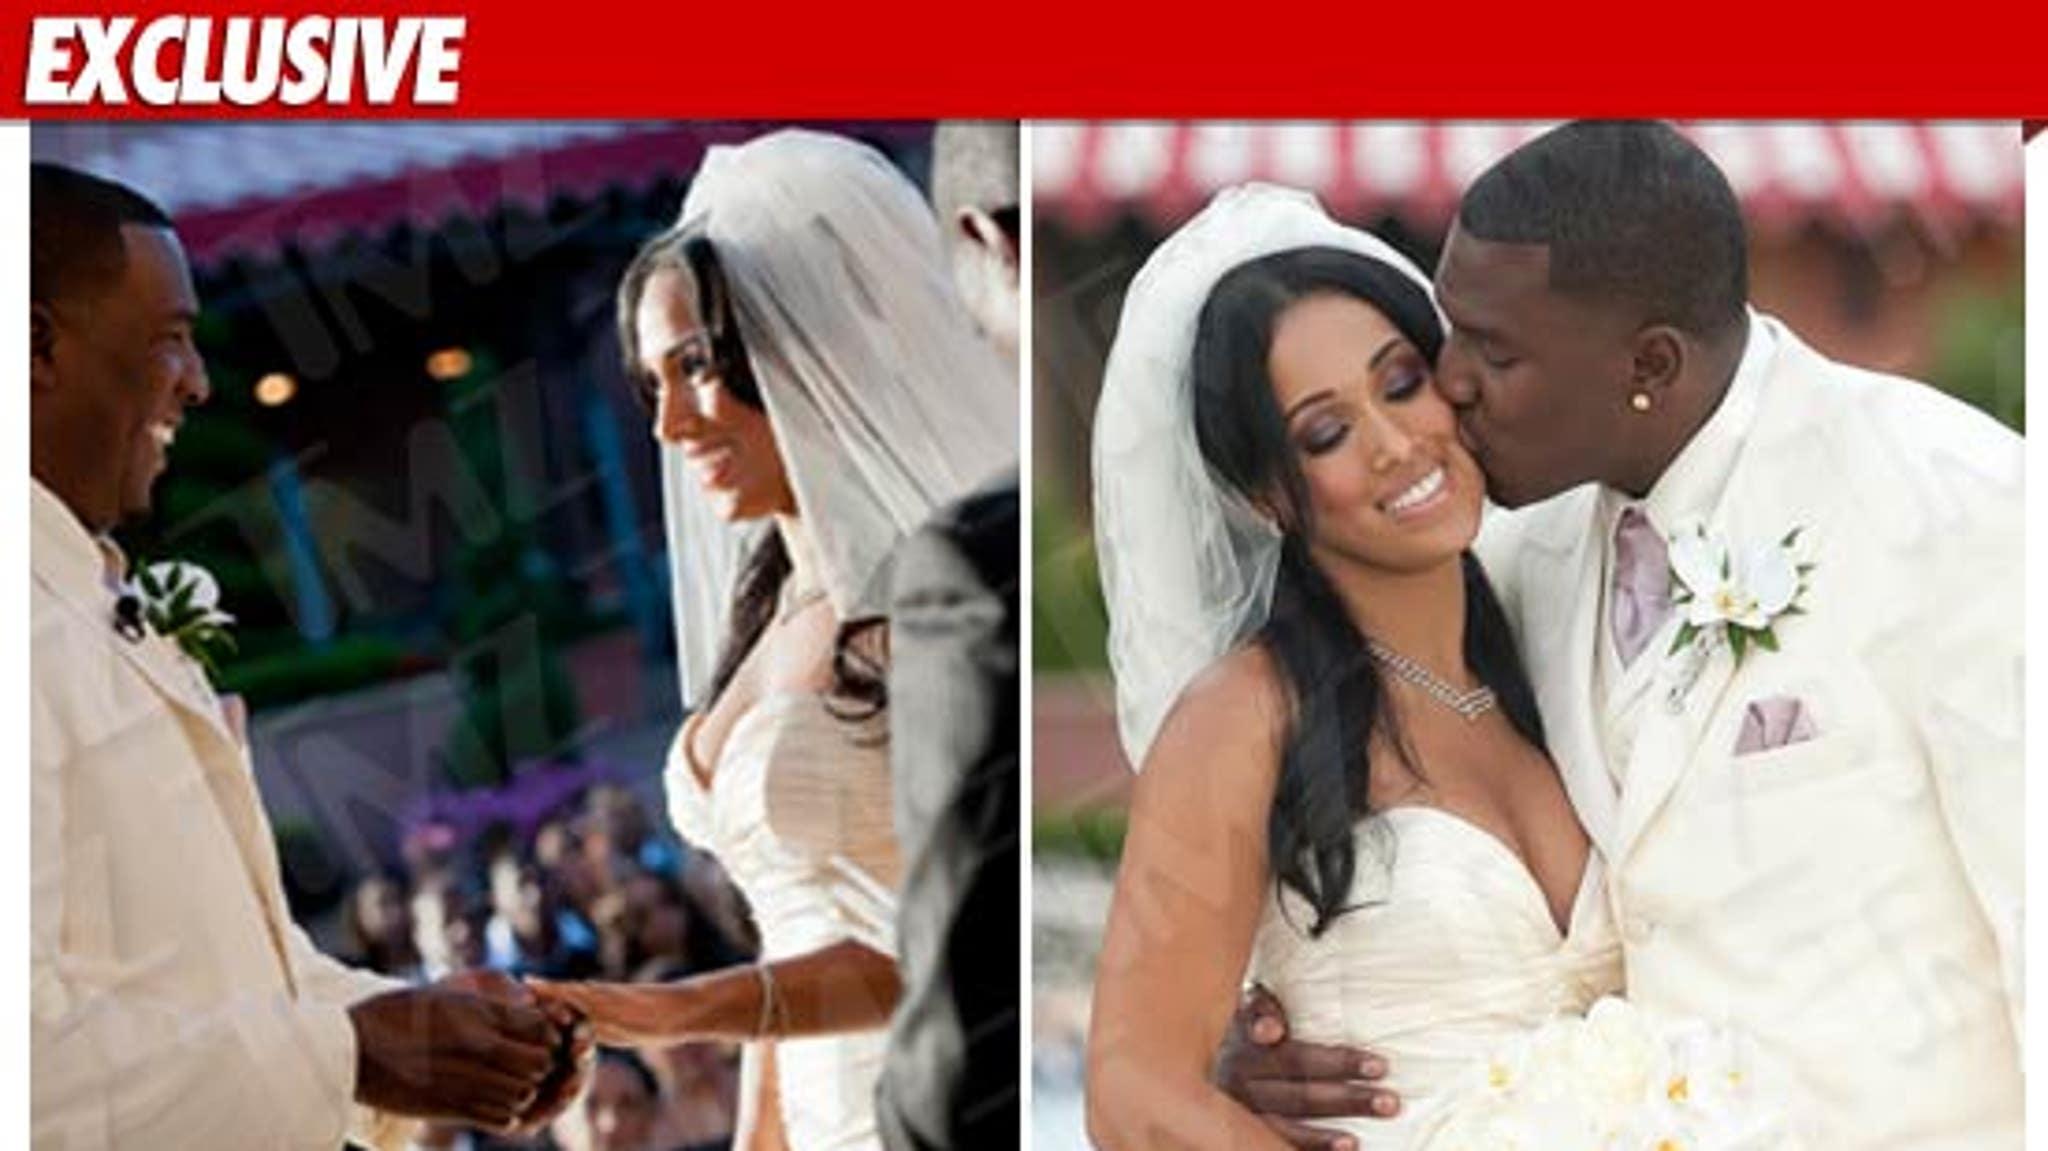 NFL Superstar Antonio Gates -- The WEDDING PICS